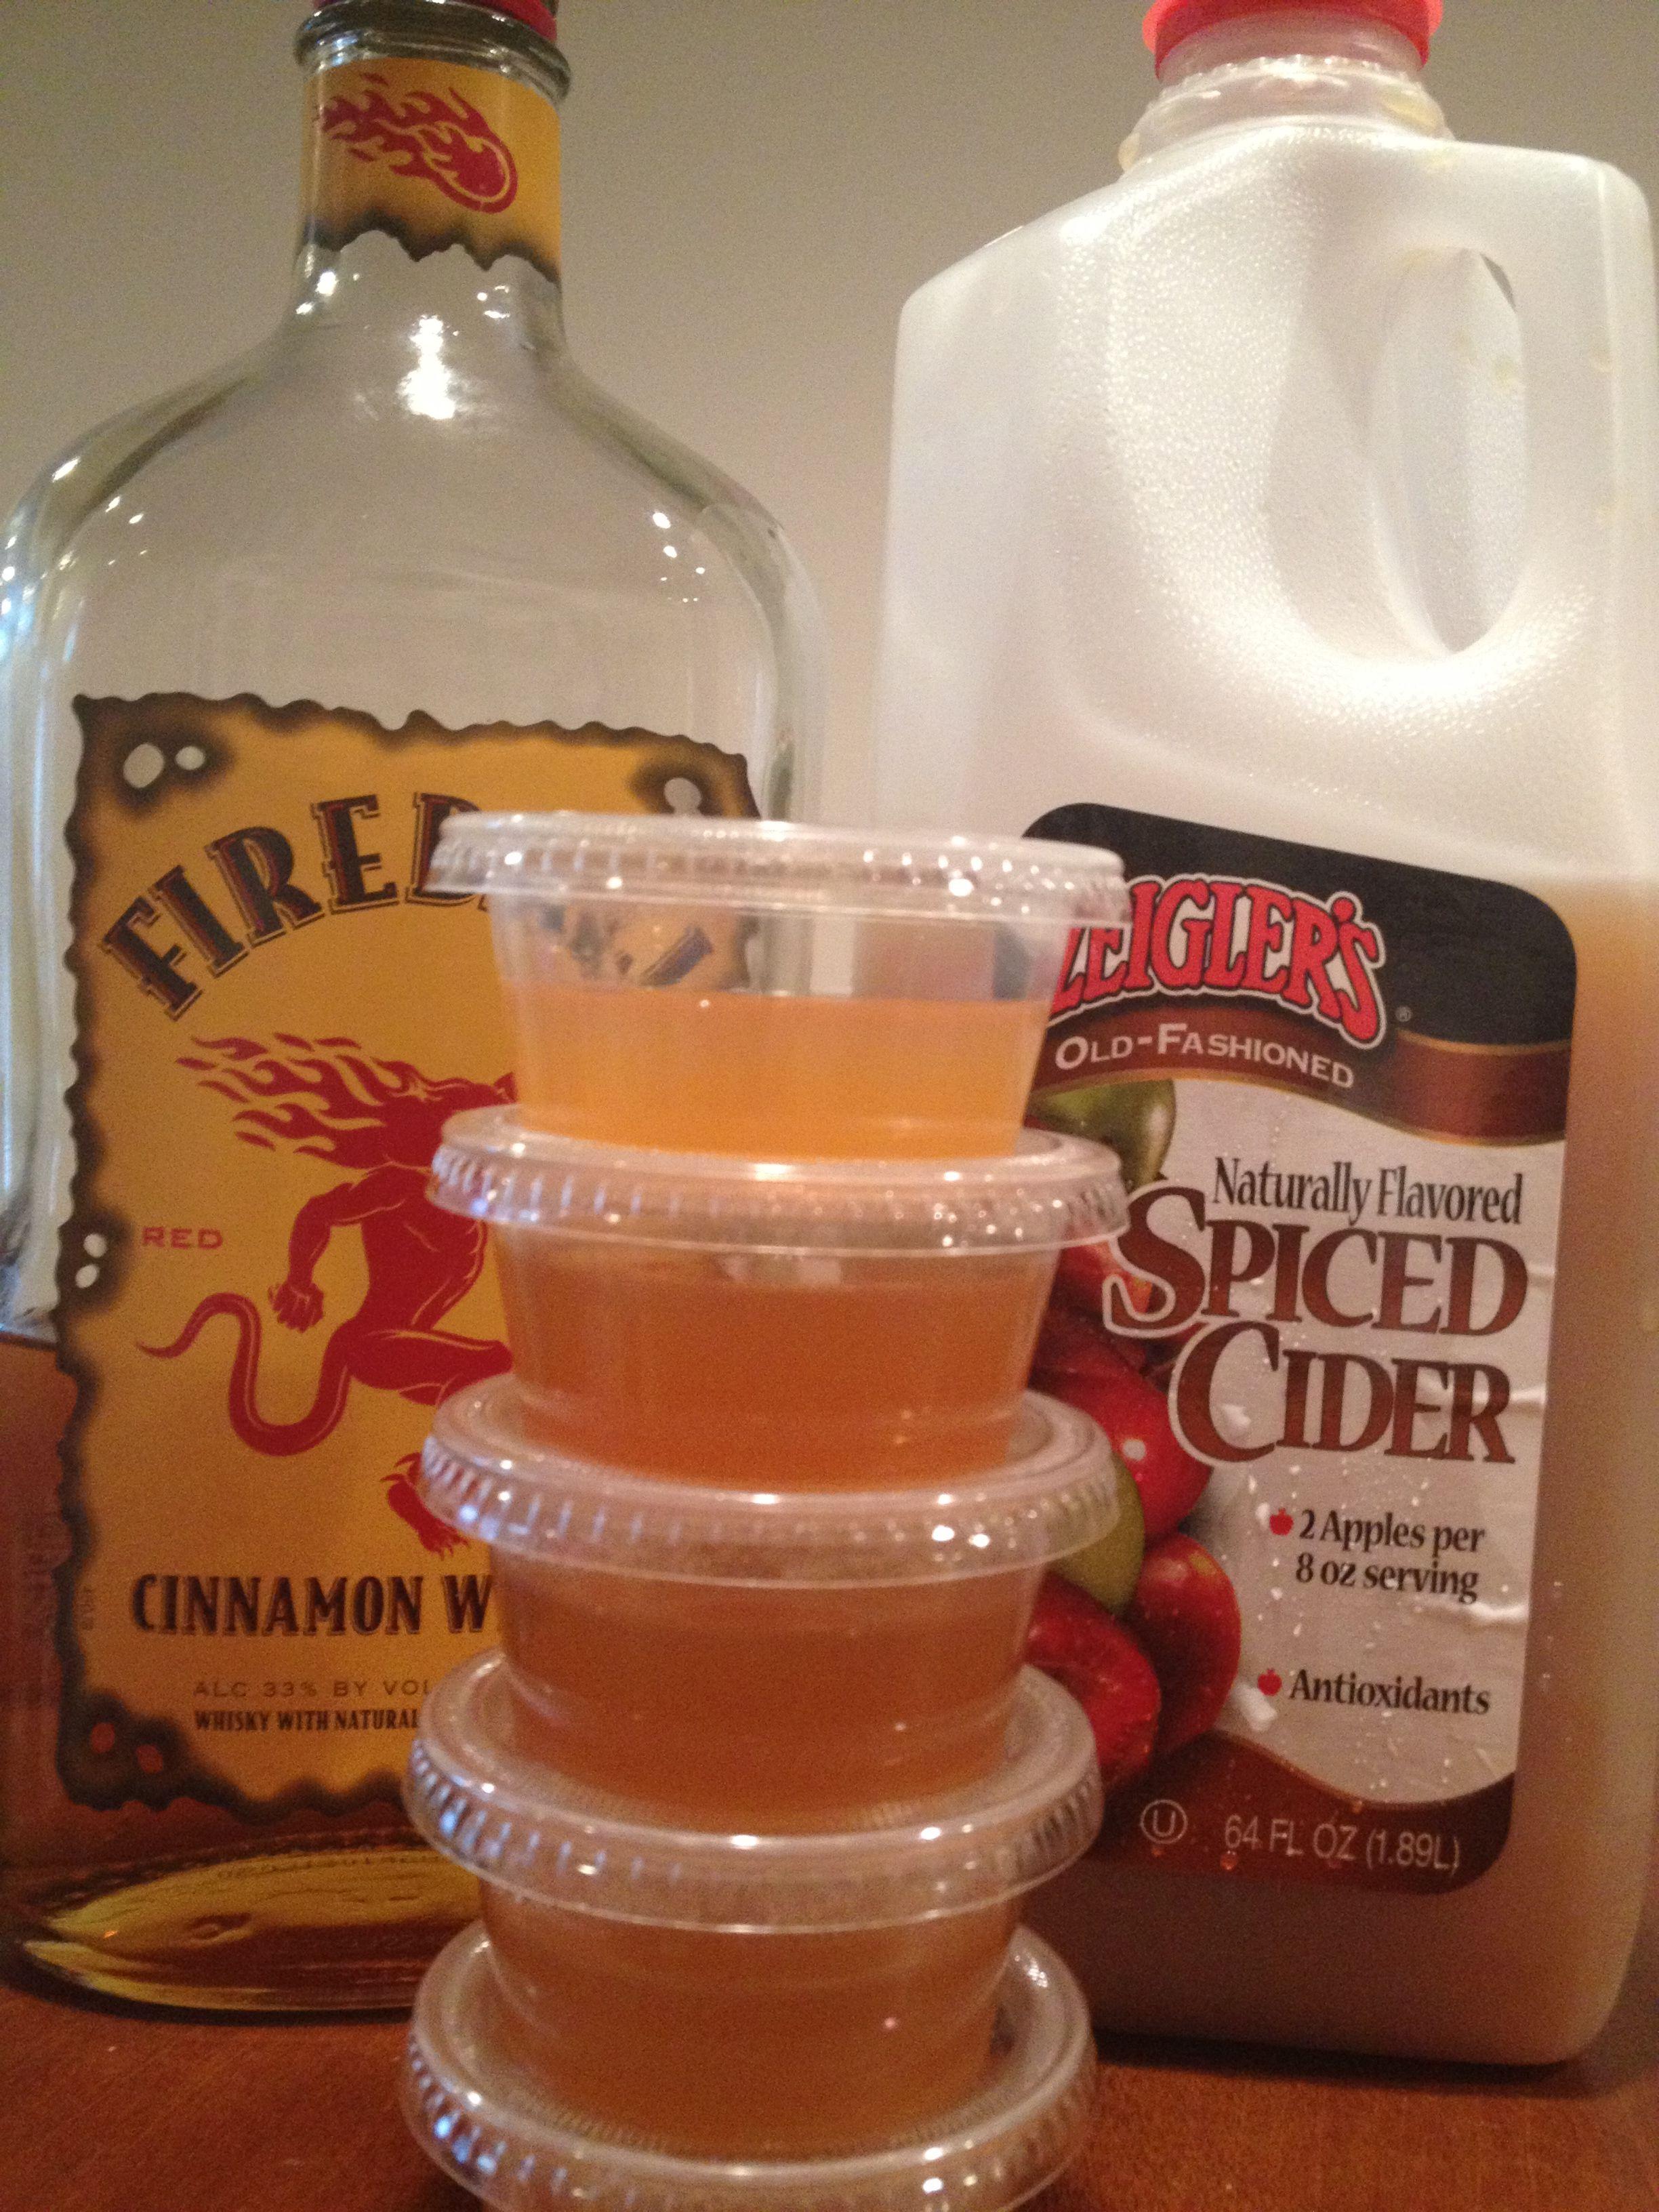 Fireball Cider Jello Shots 1 Cup Fireball 1 Cup Apple Cider 1 12